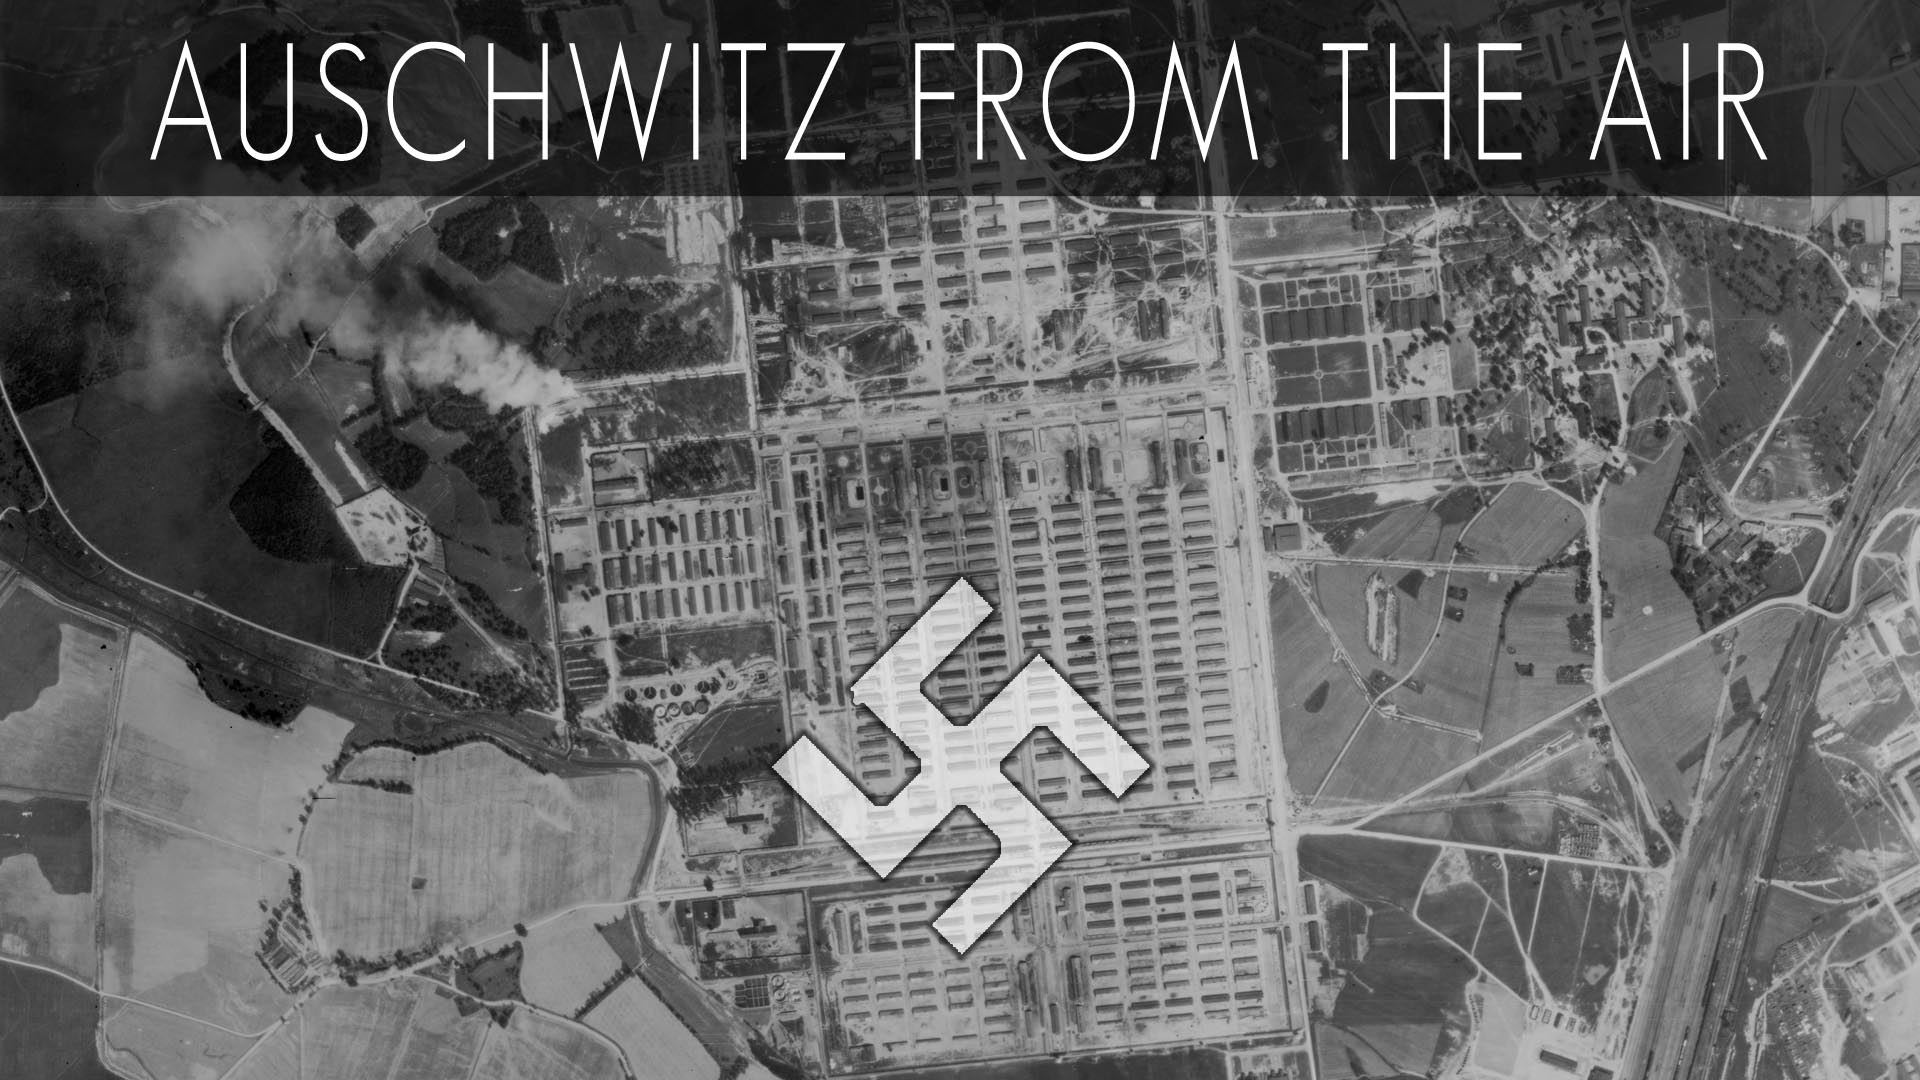 Auschwitz From The Air